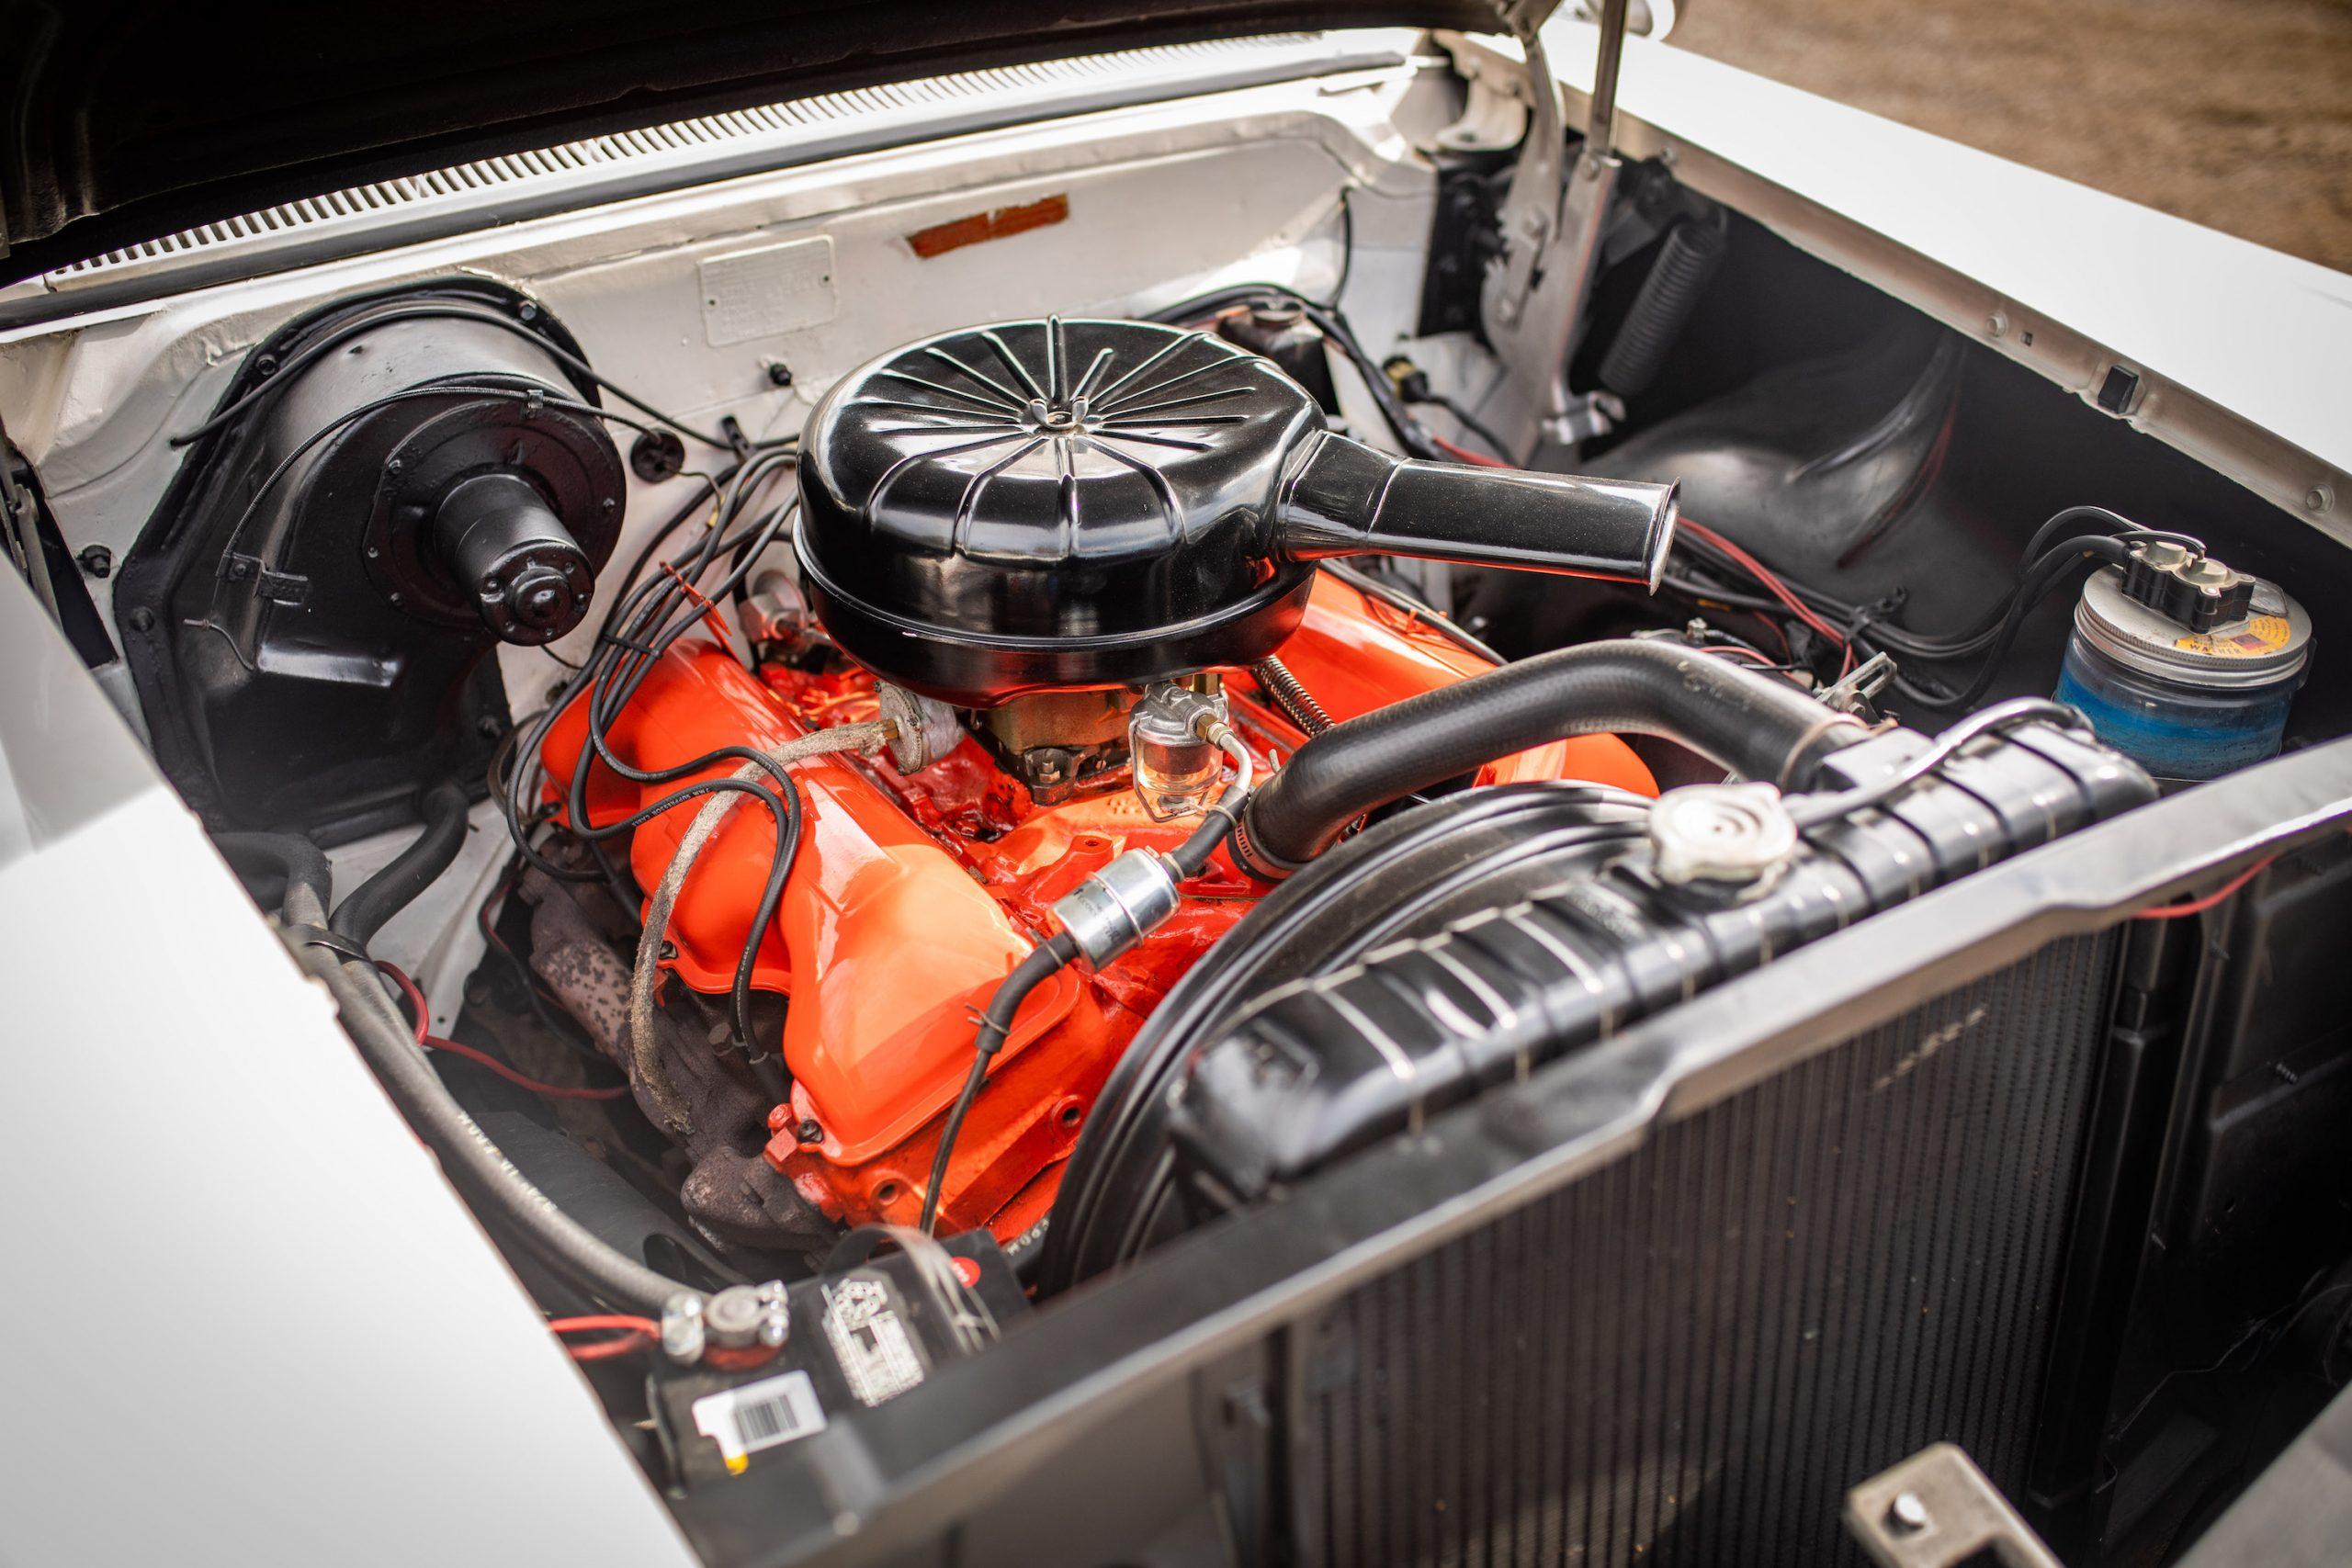 1958 Chevrolet Impala Engine